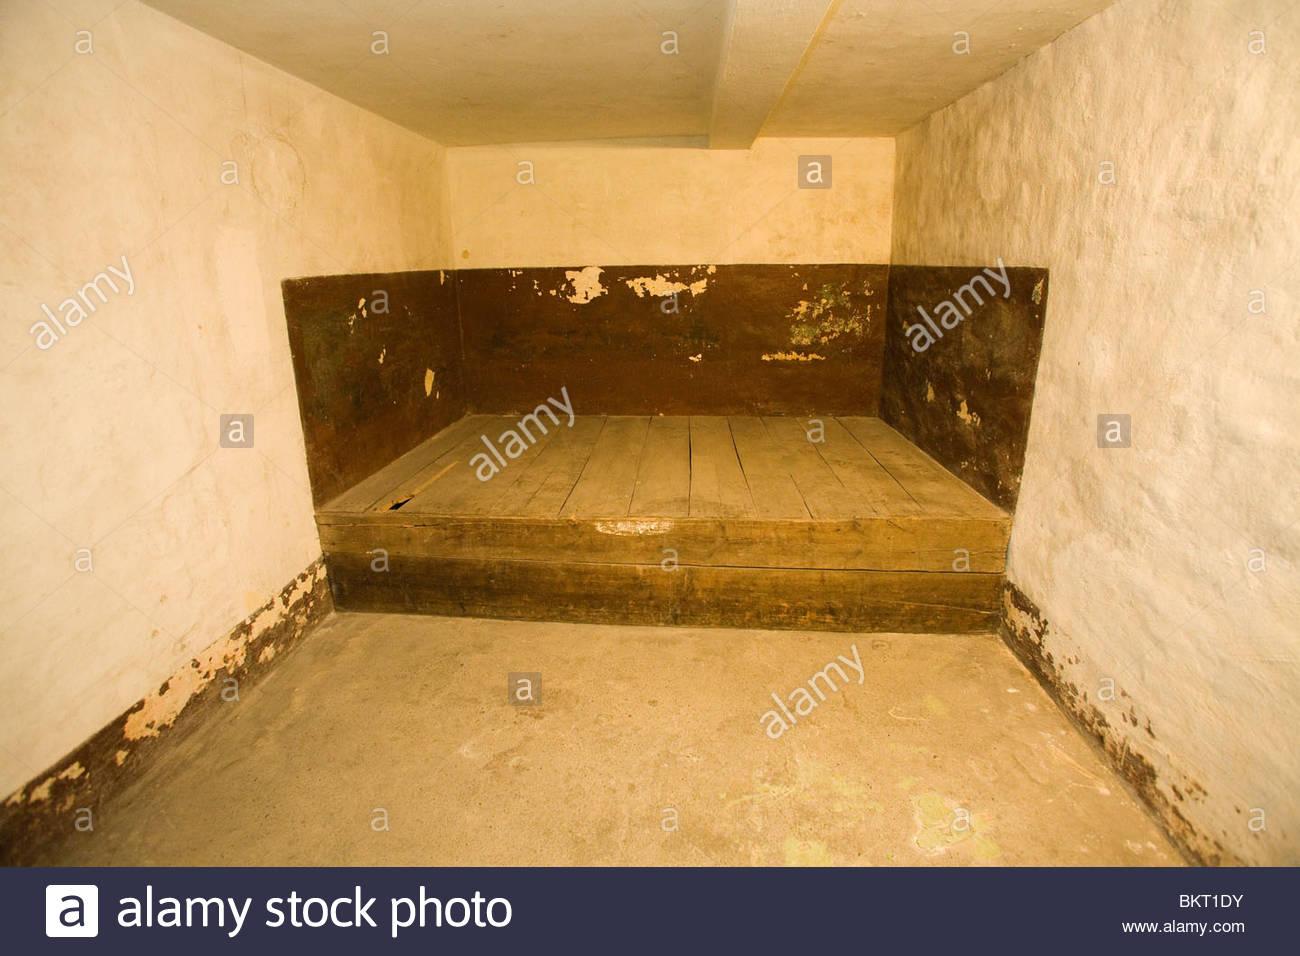 secret prison for the political prisoners,now a museum,Potsdam,Brandenburg,Germany - Stock Image